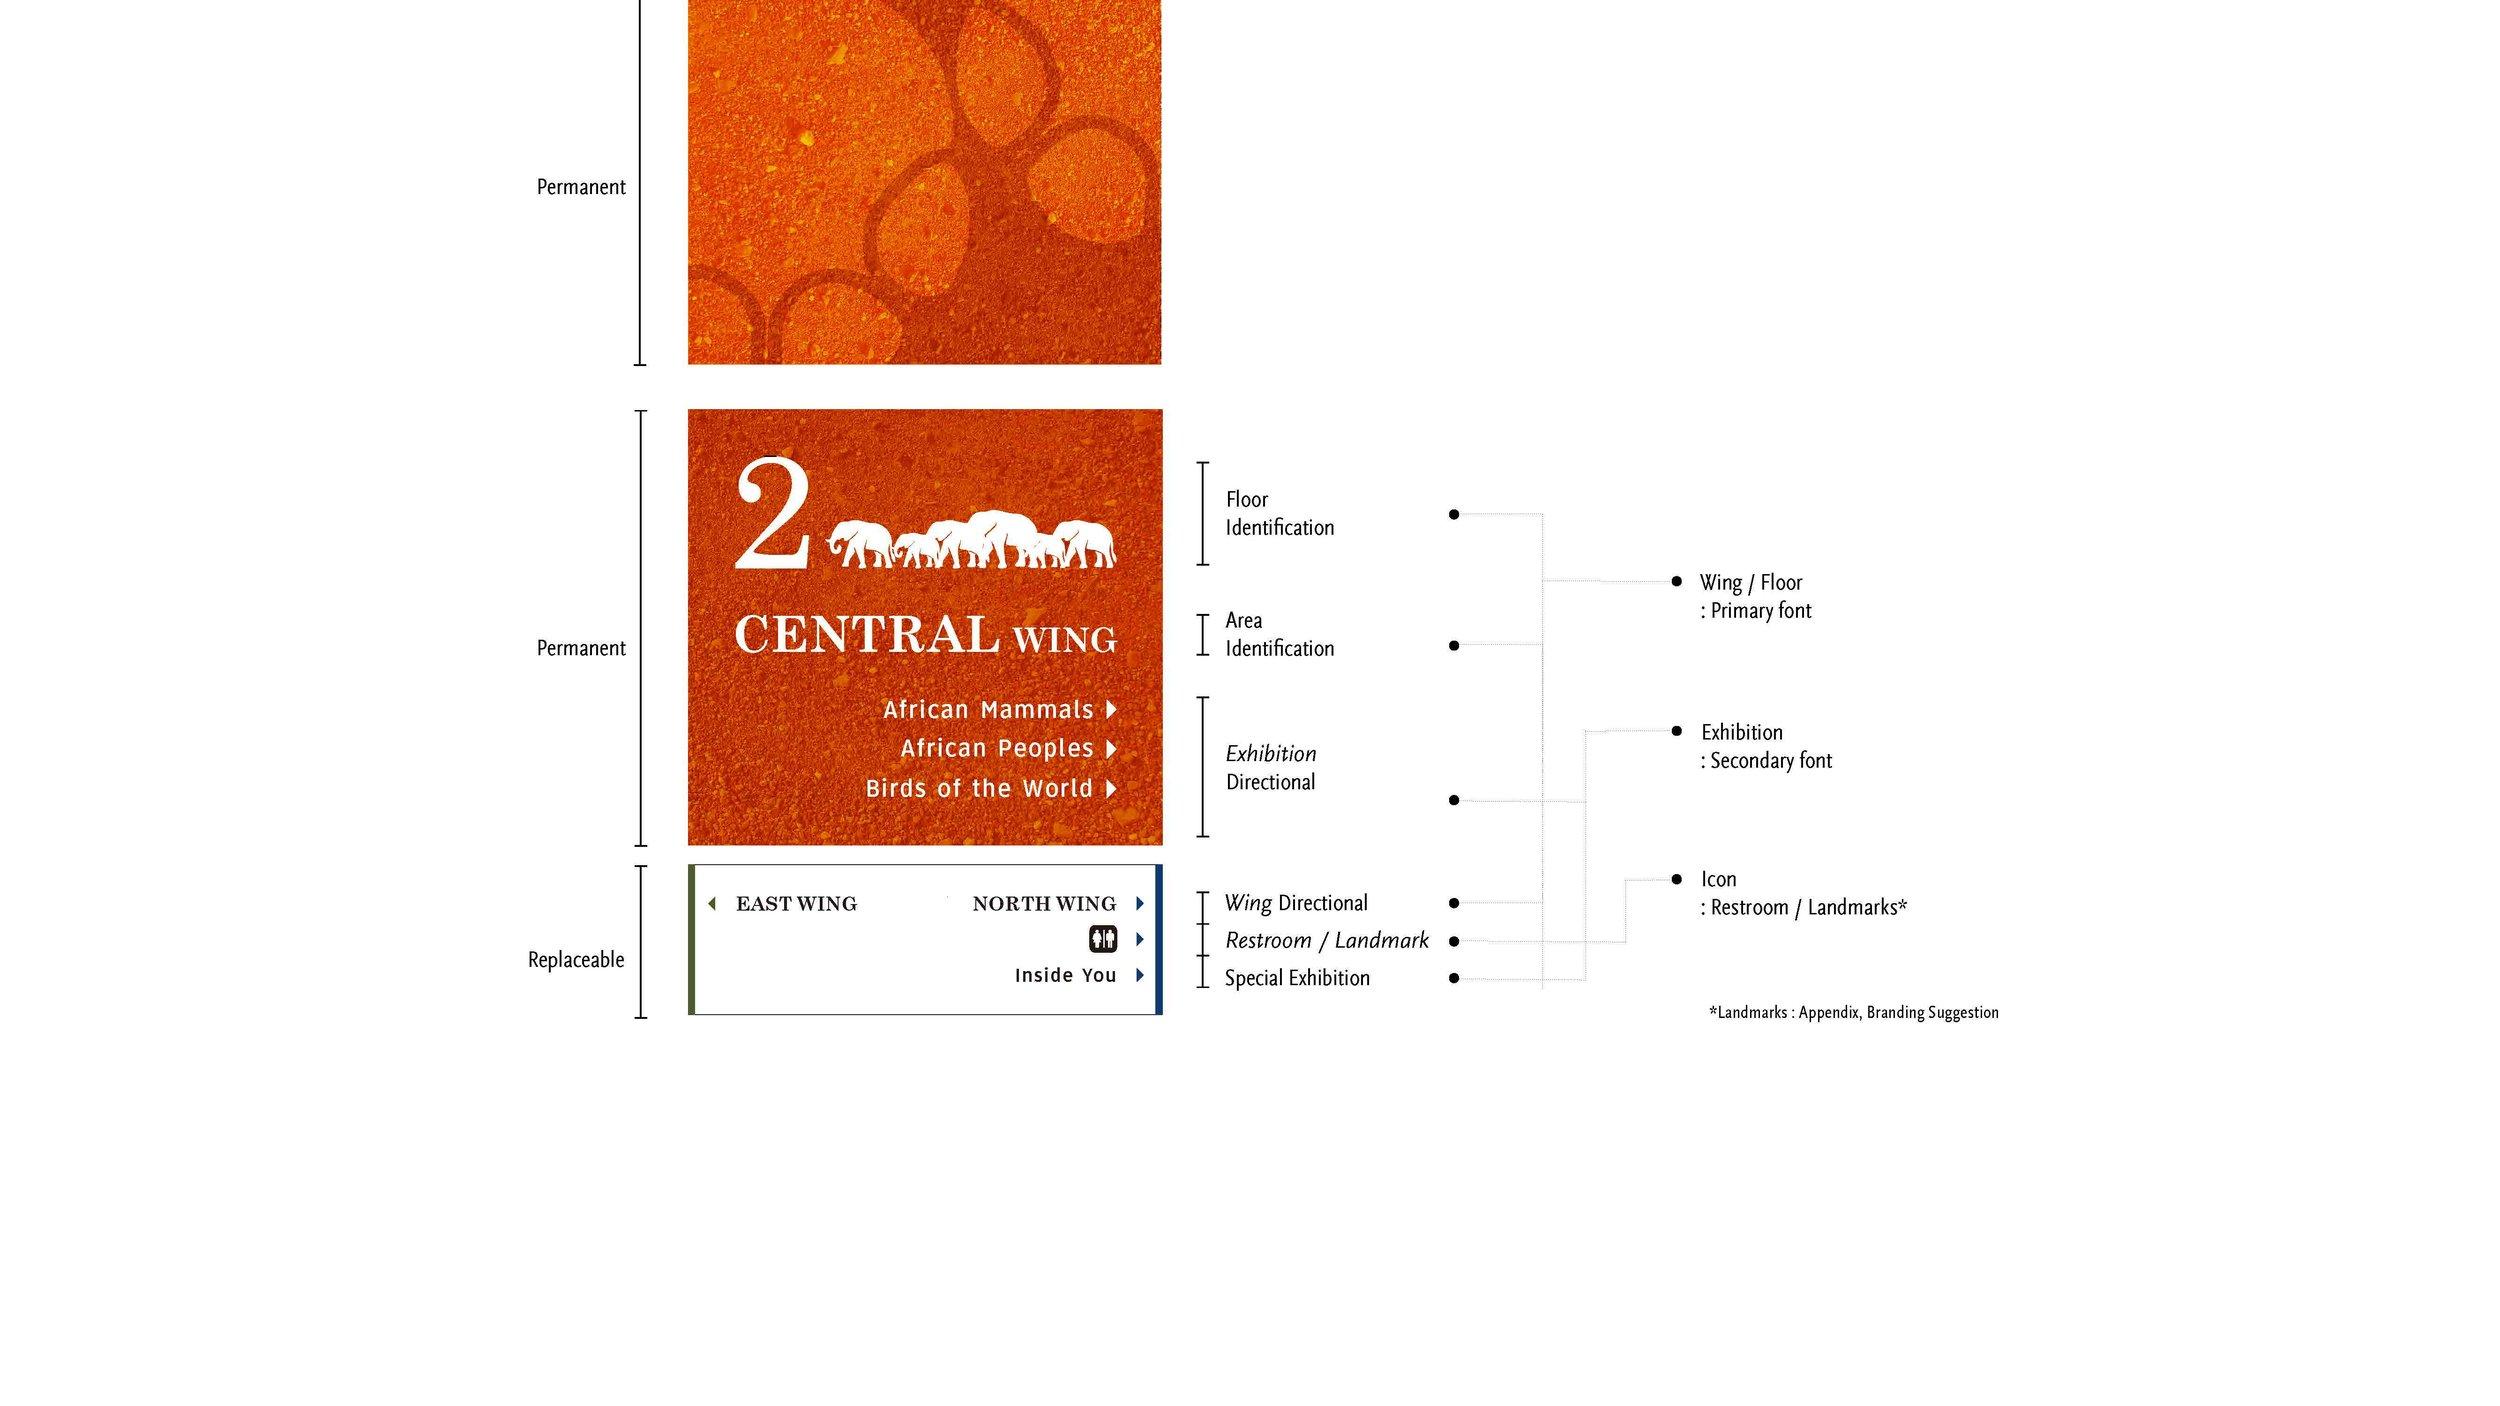 190519 AMNH Final Presentation_Page_24.jpg